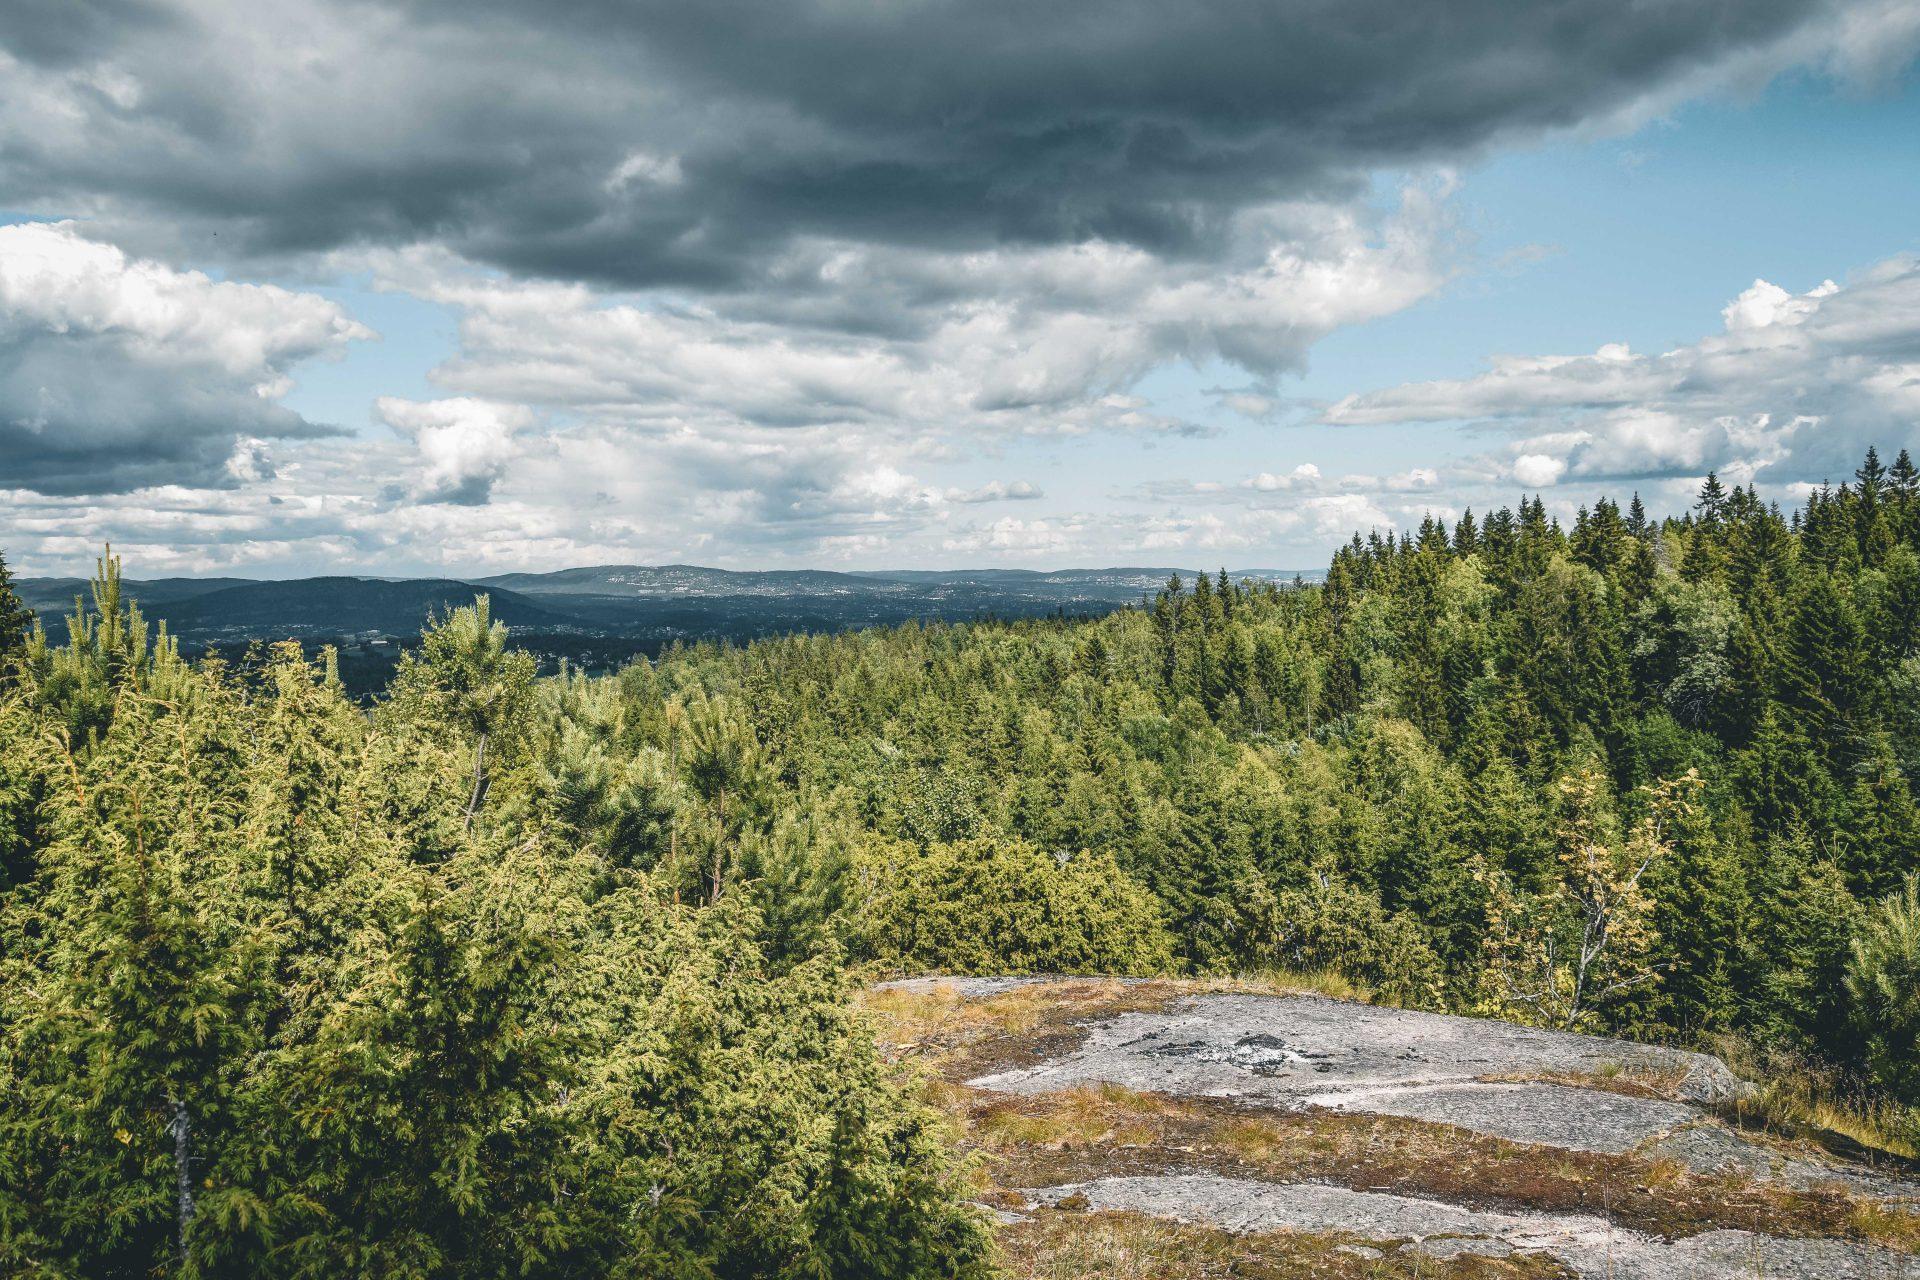 okolice Oslo